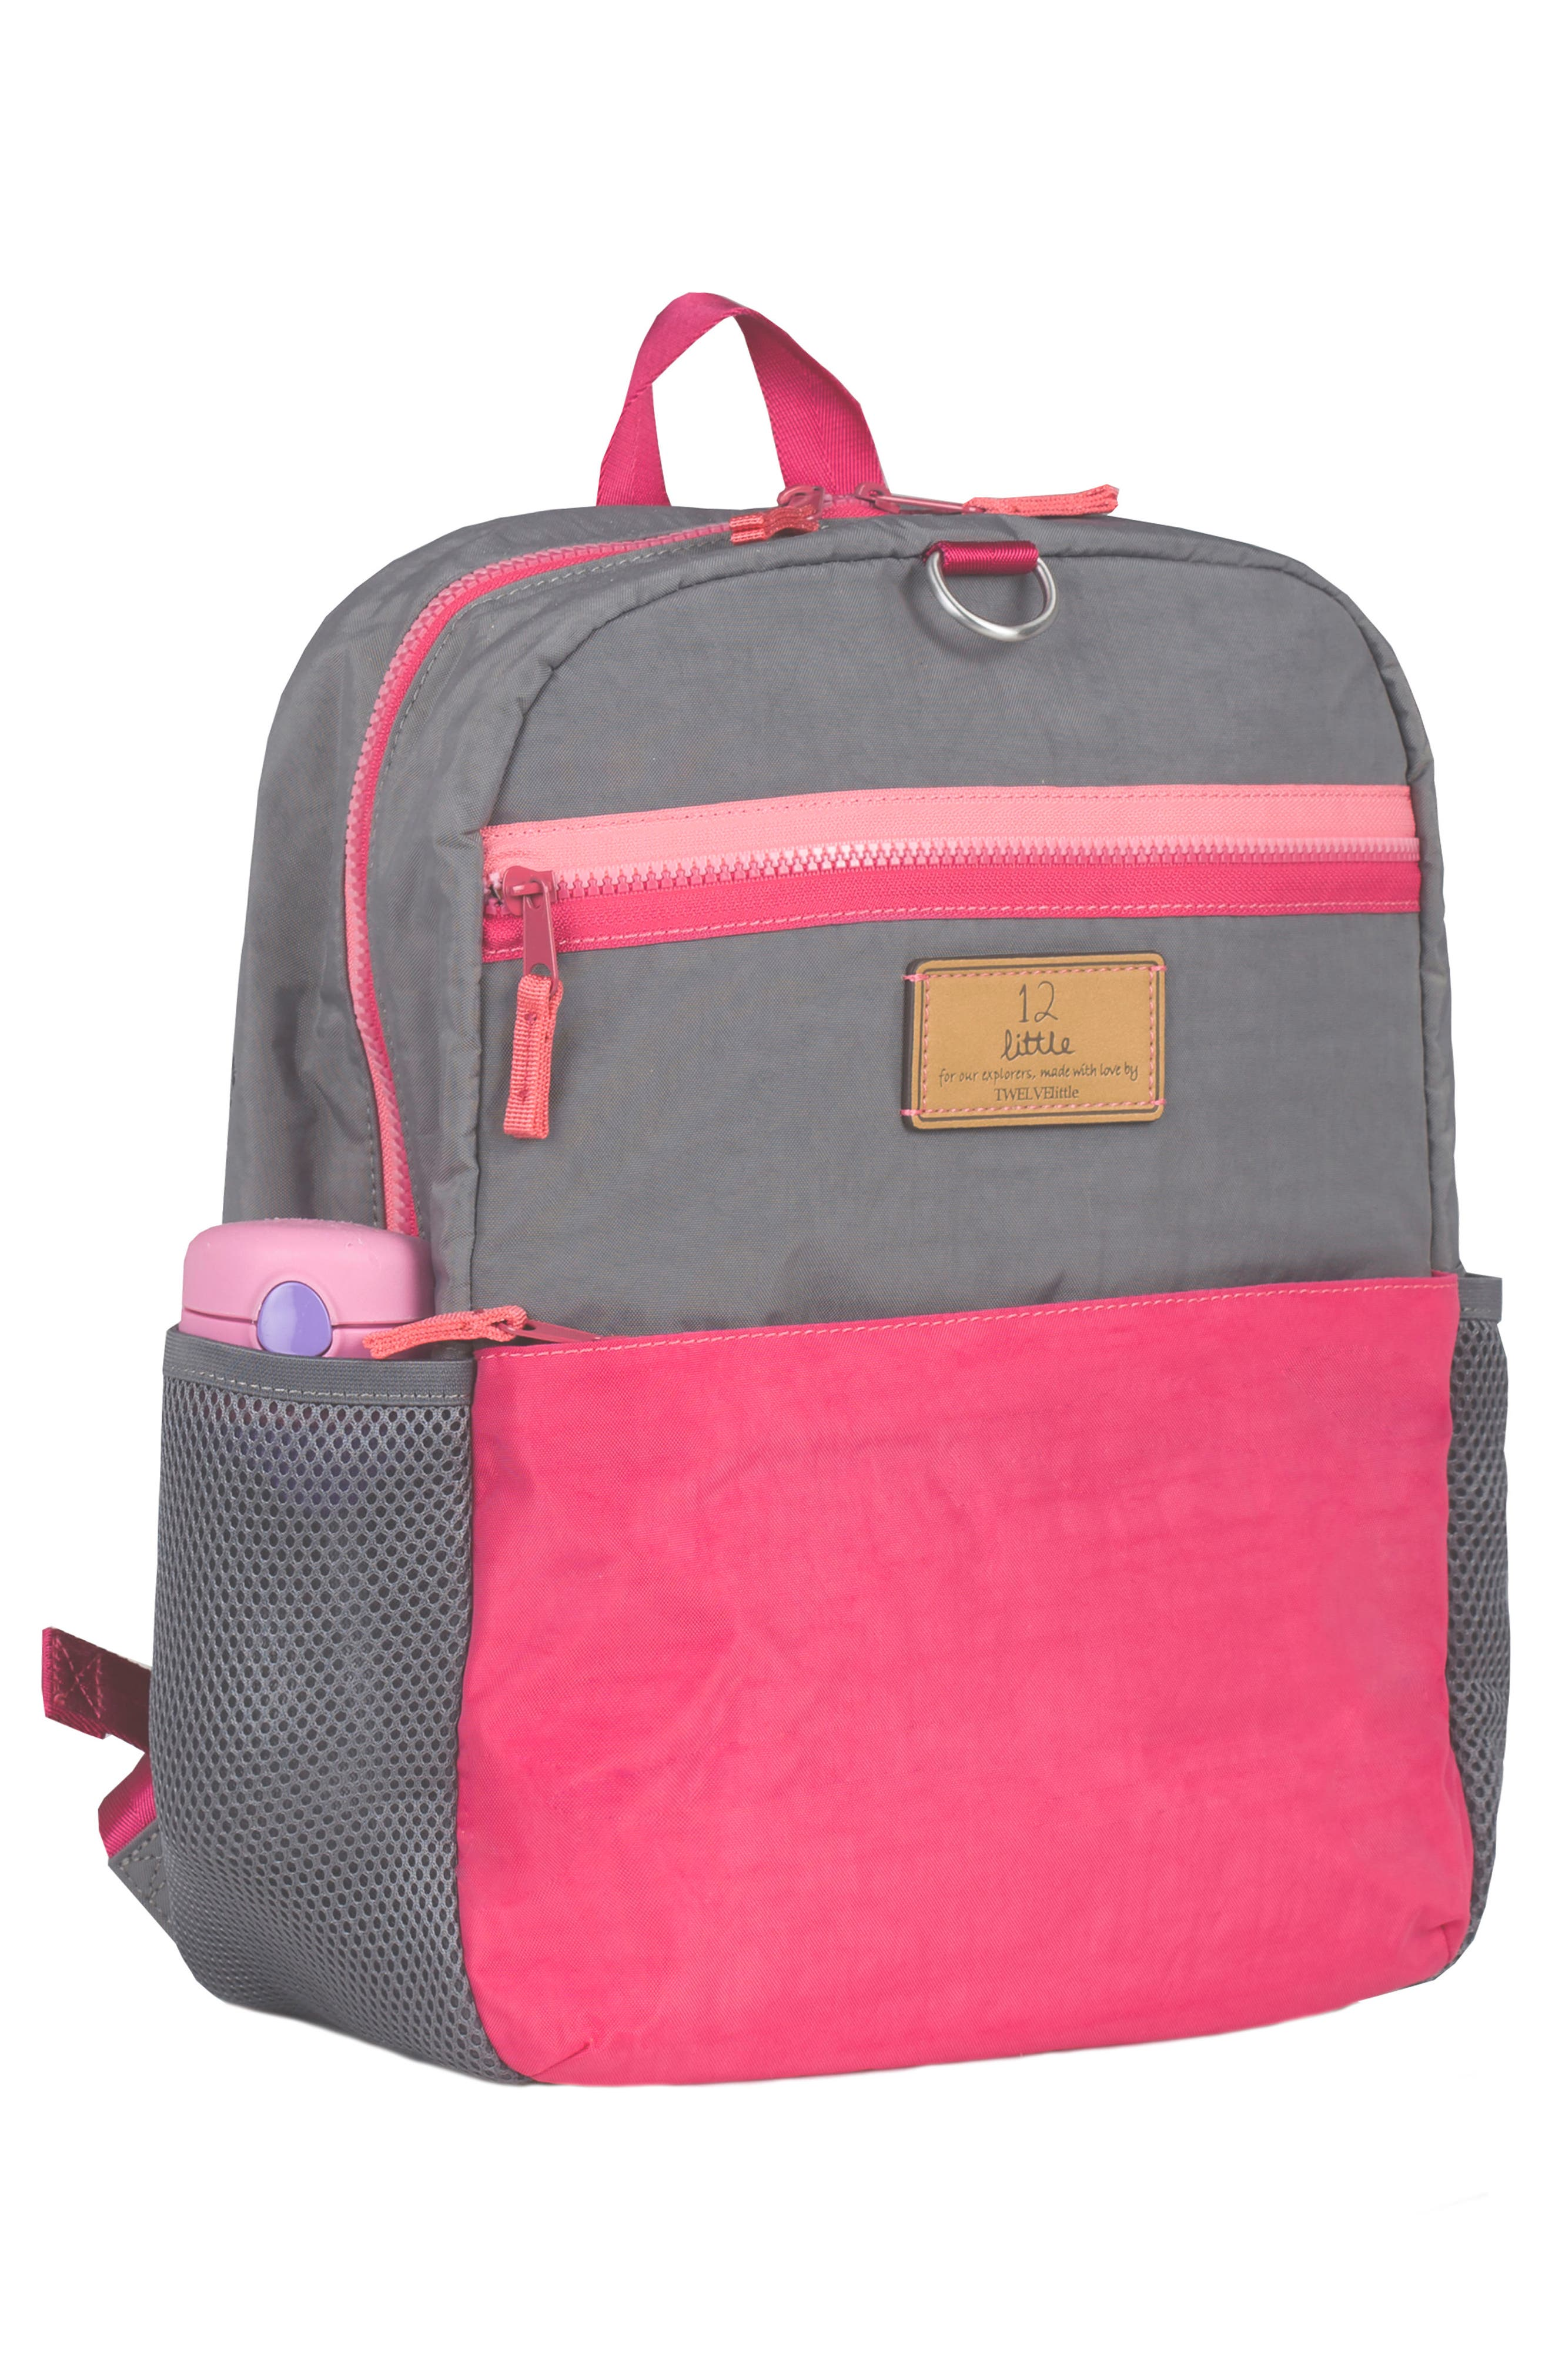 Alternate Image 3  - TWELVElittle Courage Backpack (Kids)